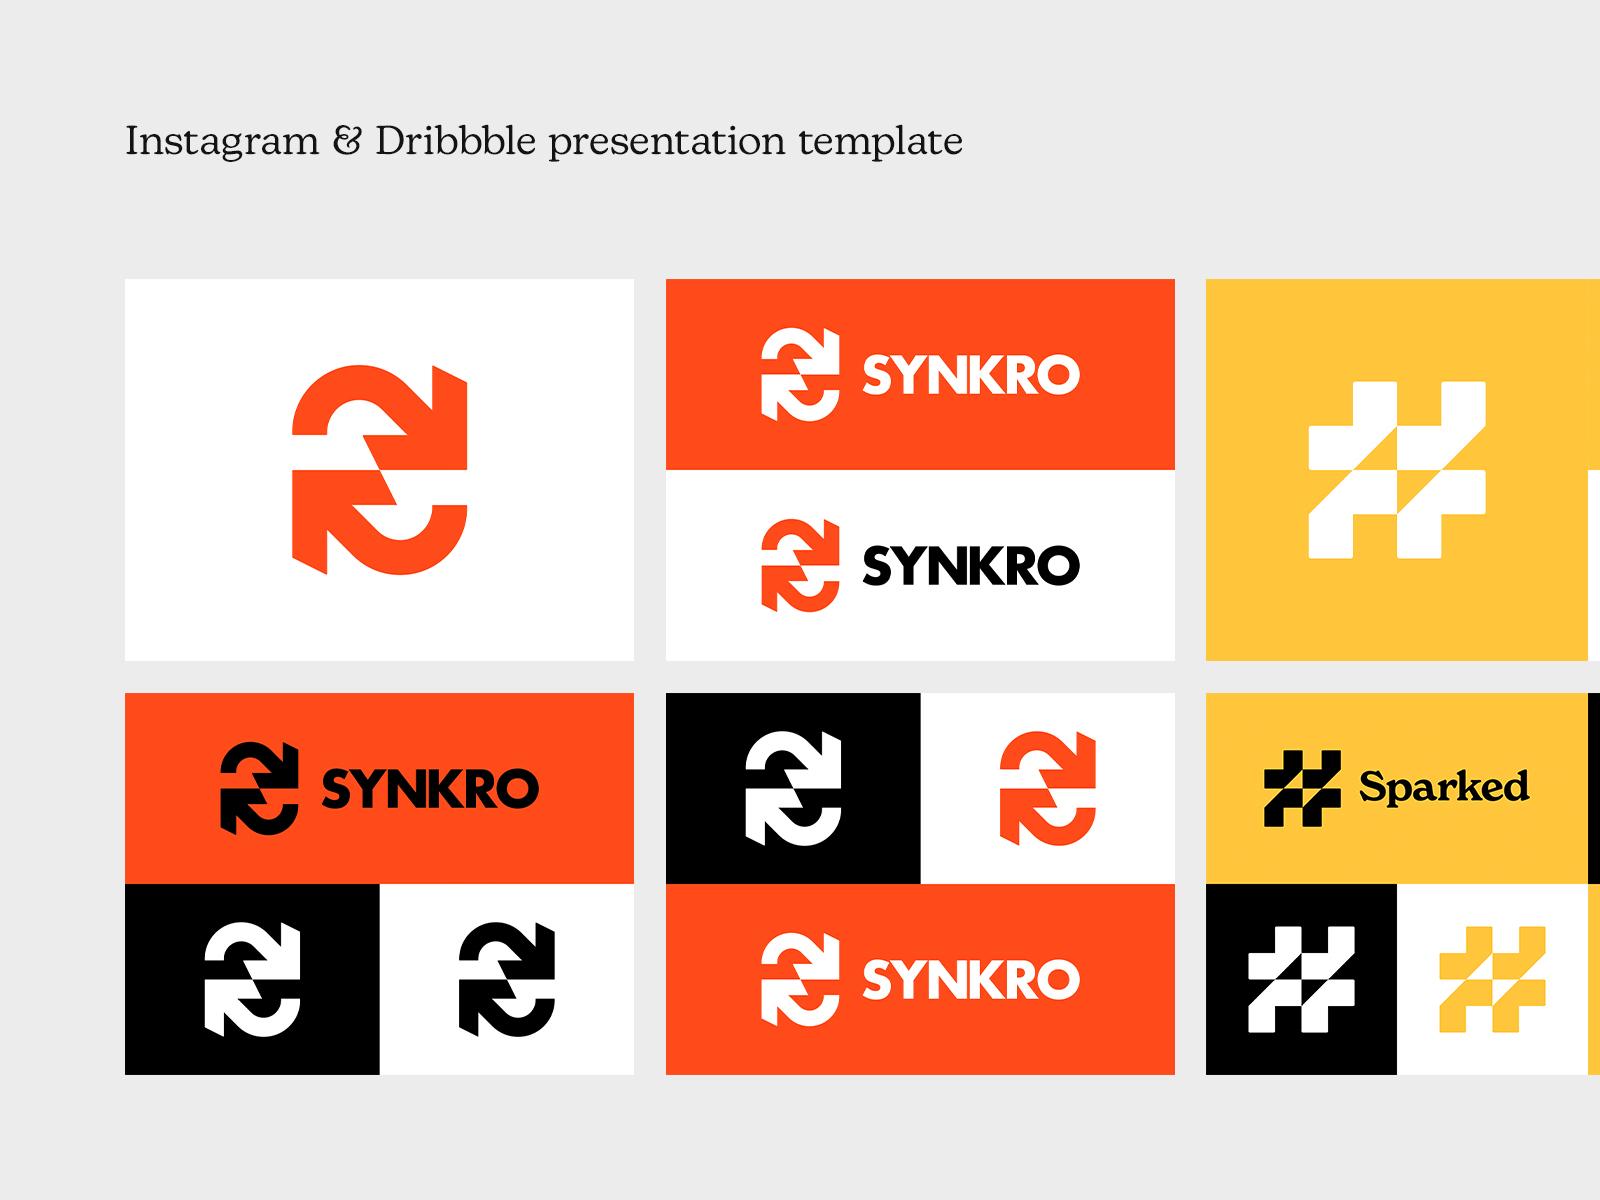 Instagram & Dribbble Logo Presentation Template (Free)